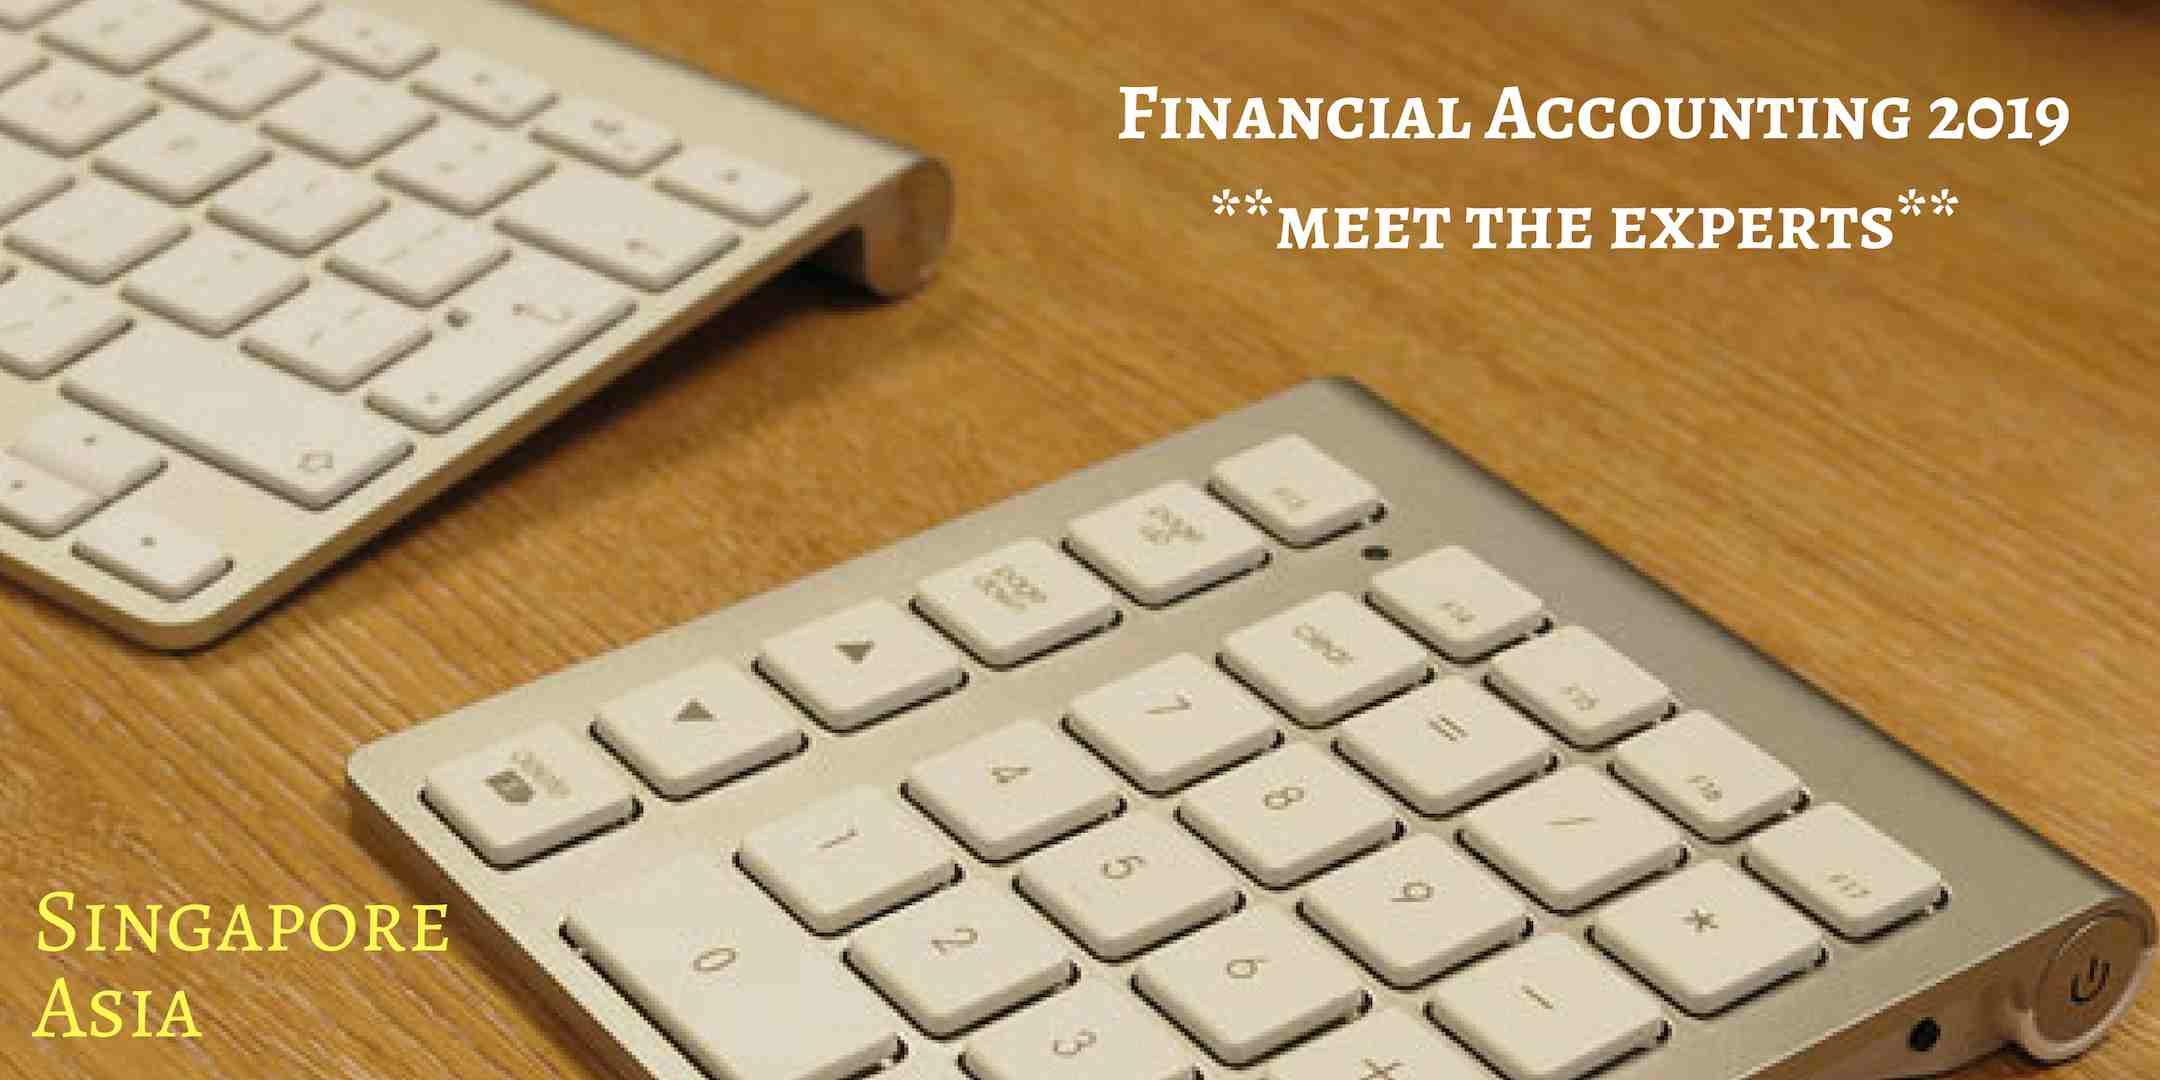 - Accounting 2019